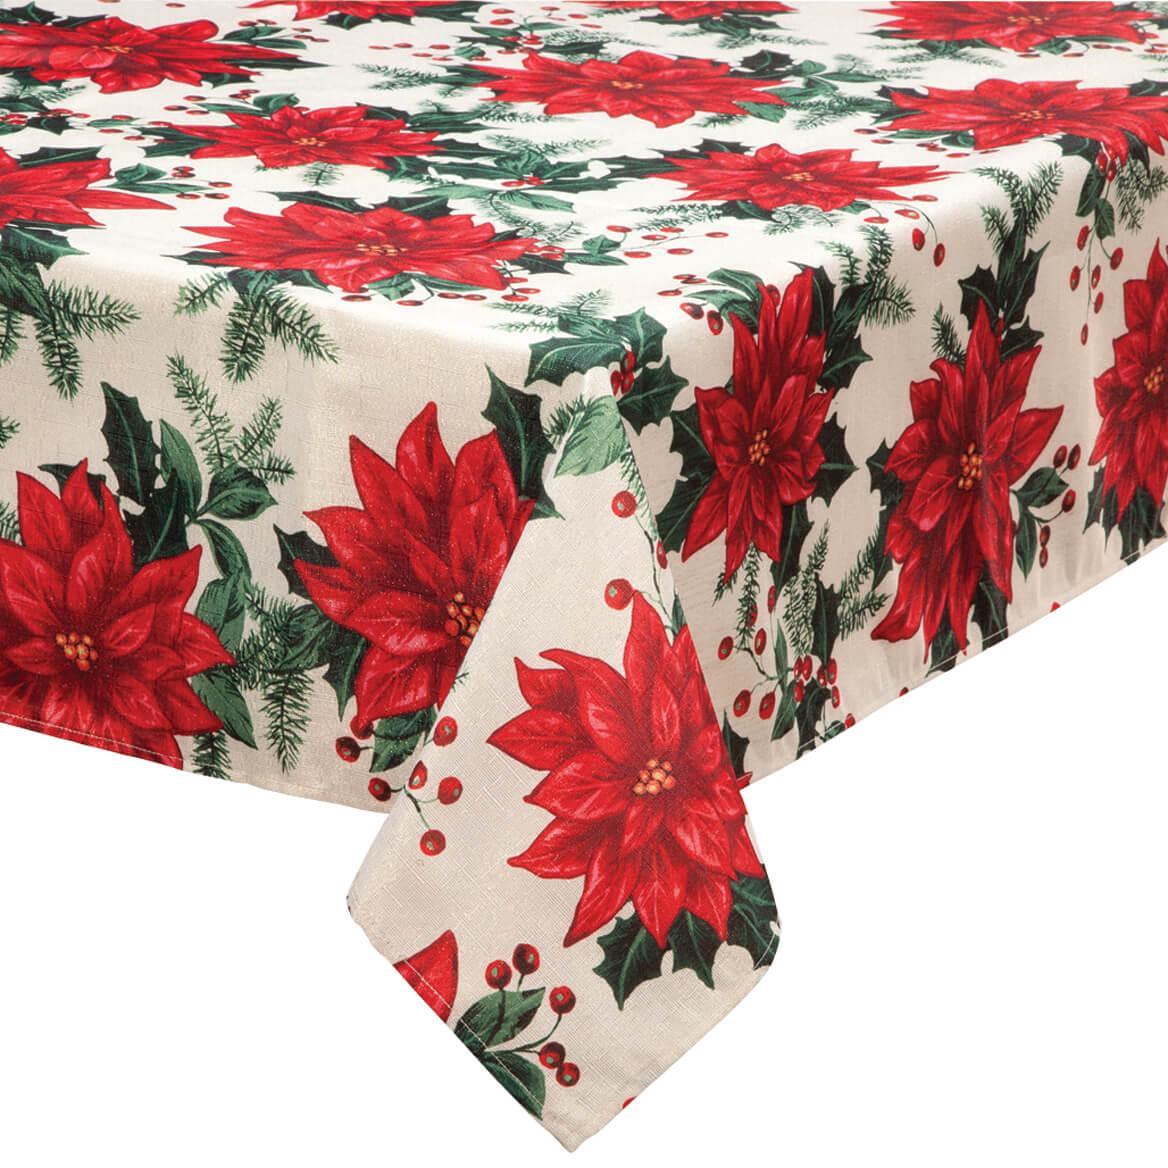 Poinsettia Metallic Fabric Tablecloth